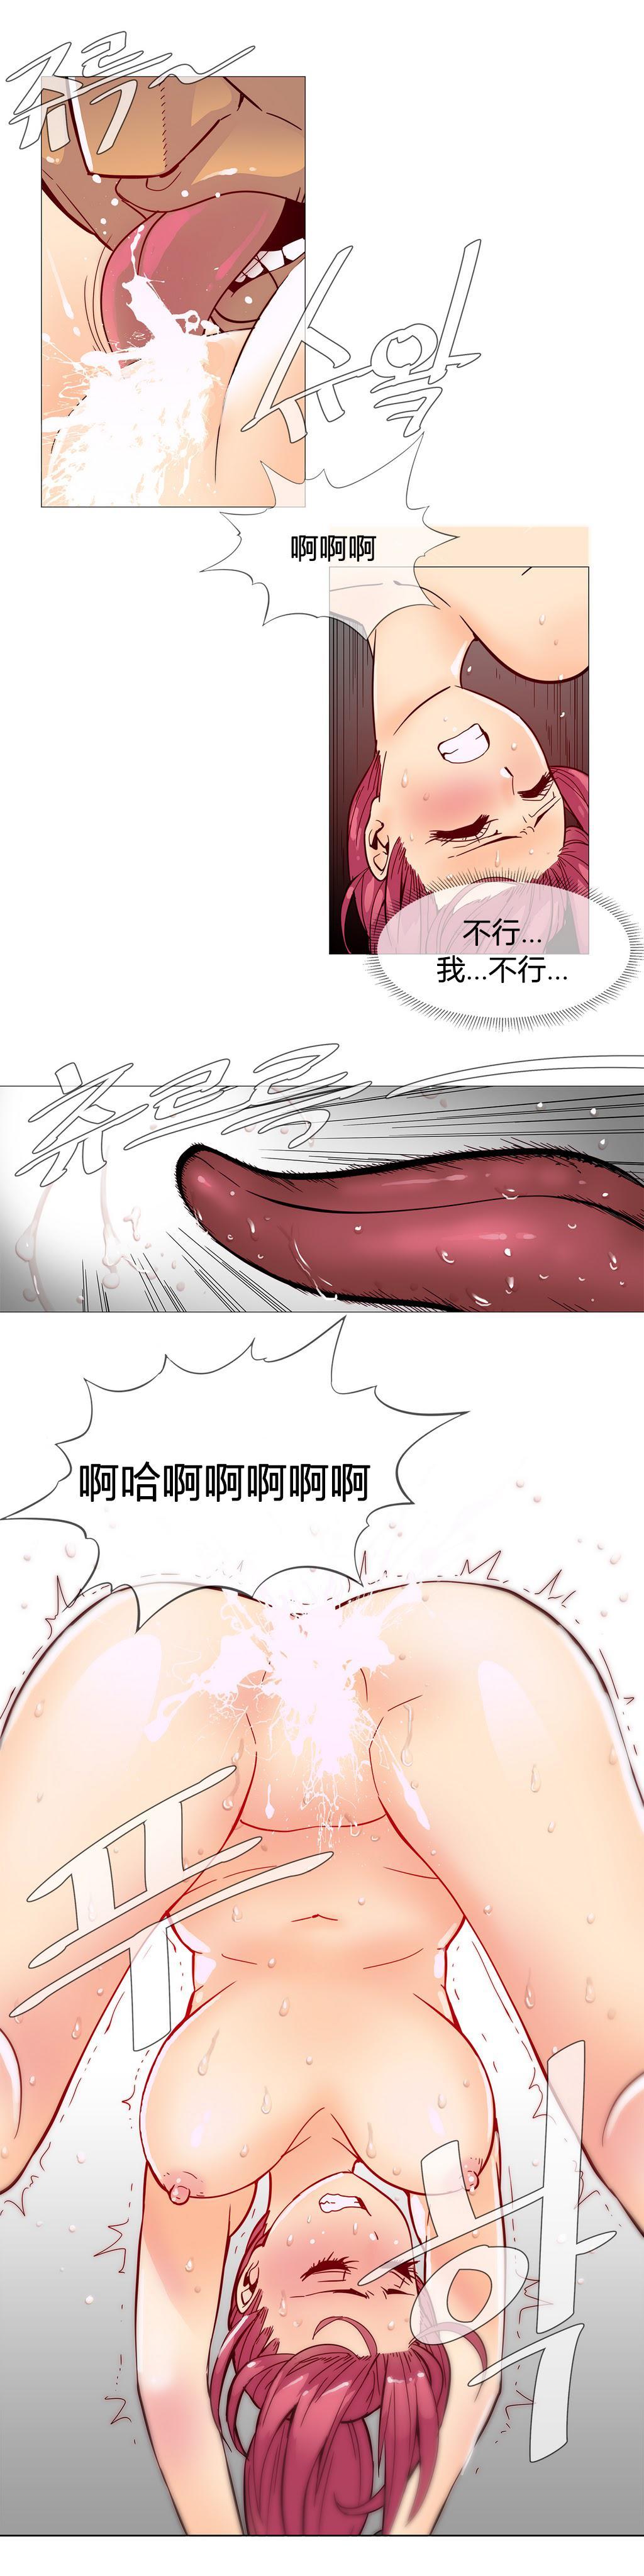 HouseHold Affairs 【卞赤鲤个人汉化】1~21话(持续更新中) 202